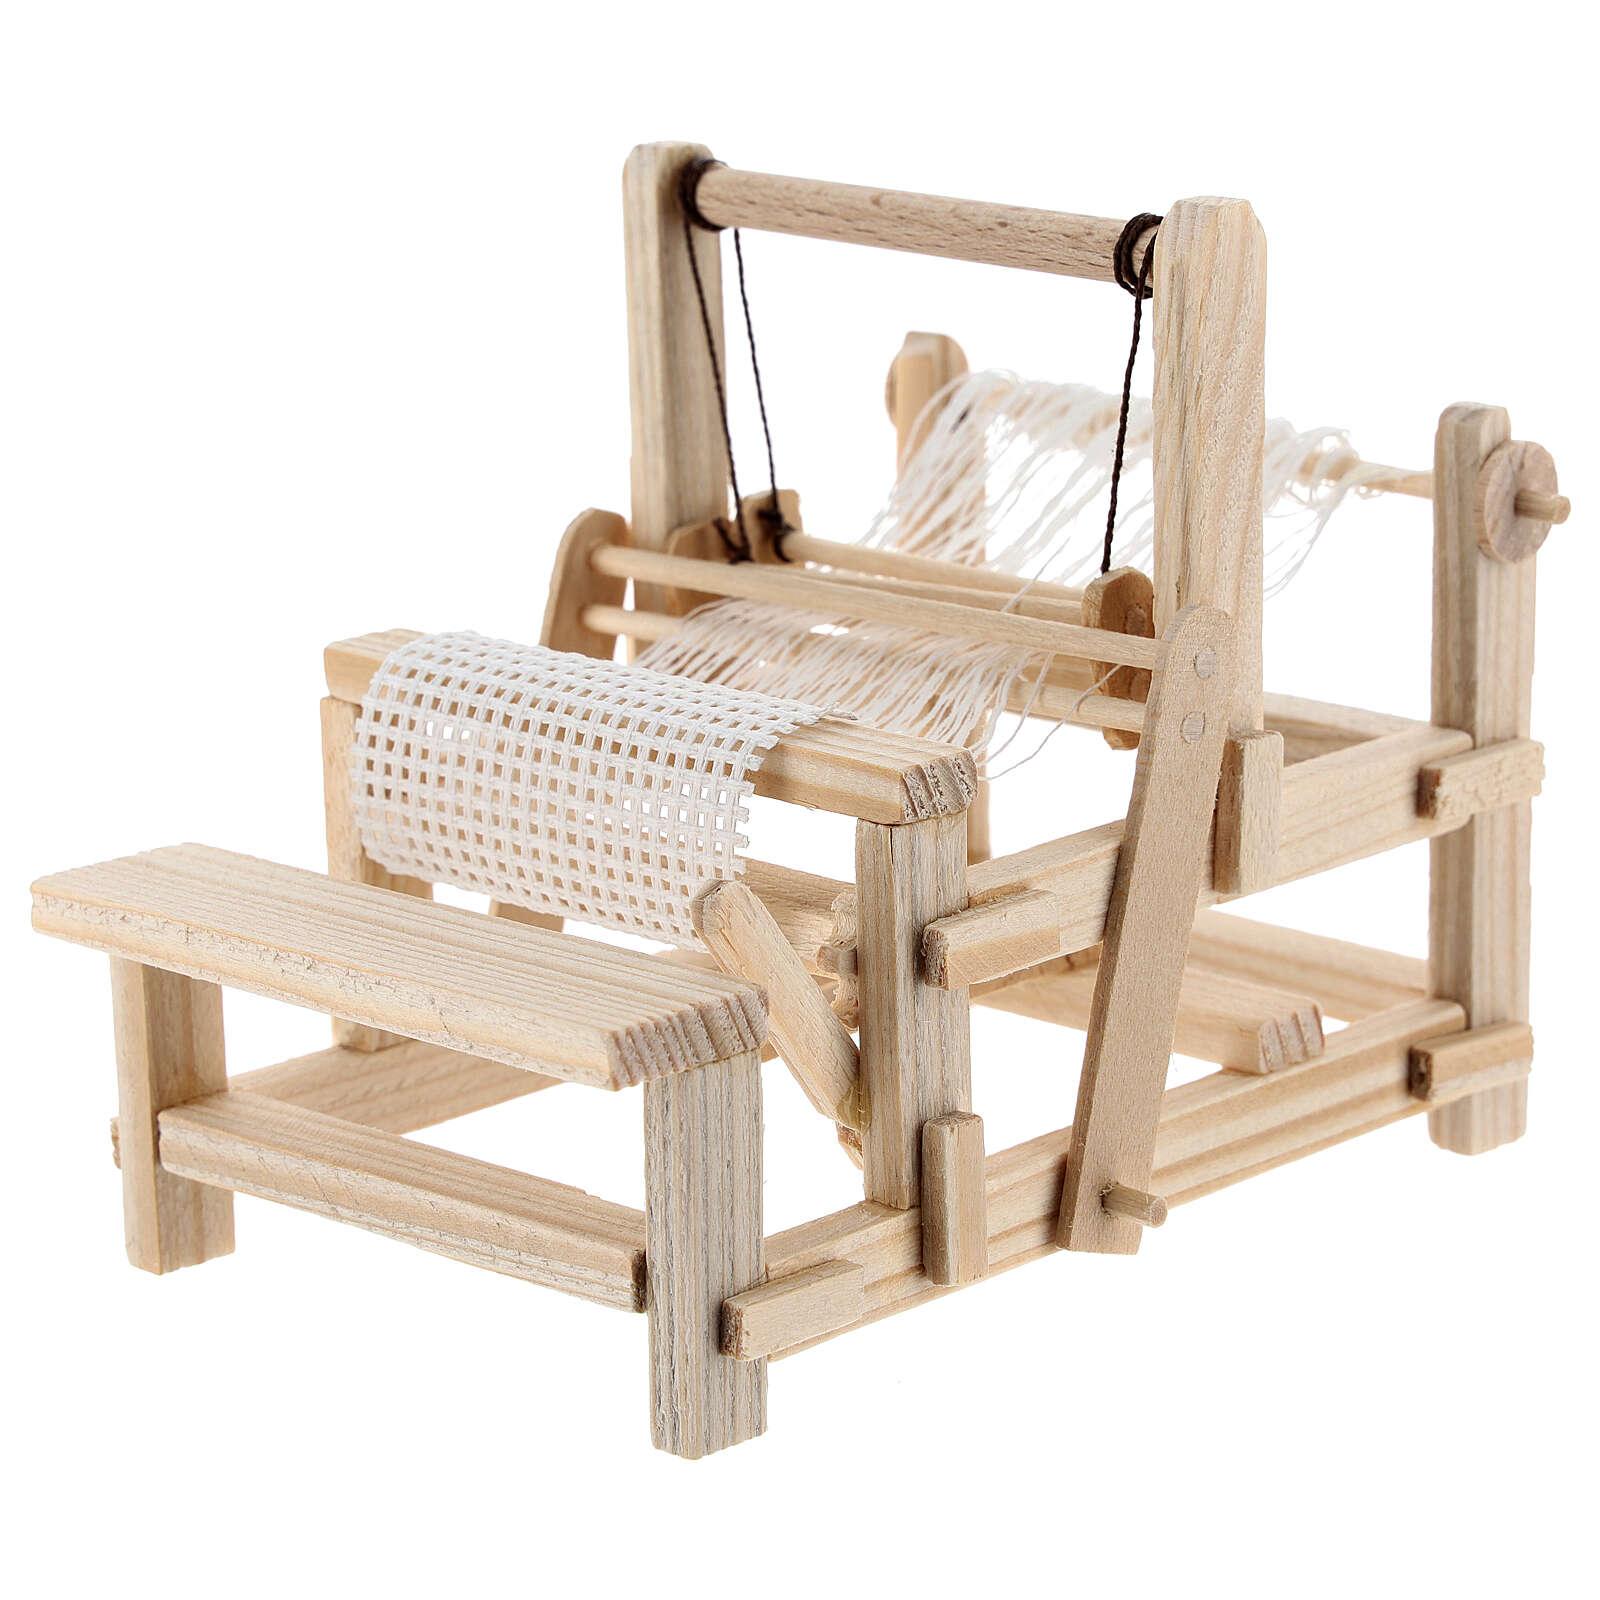 Wood loom 10x10x5 cm for Nativity Scene with 12-14 cm figurines 4